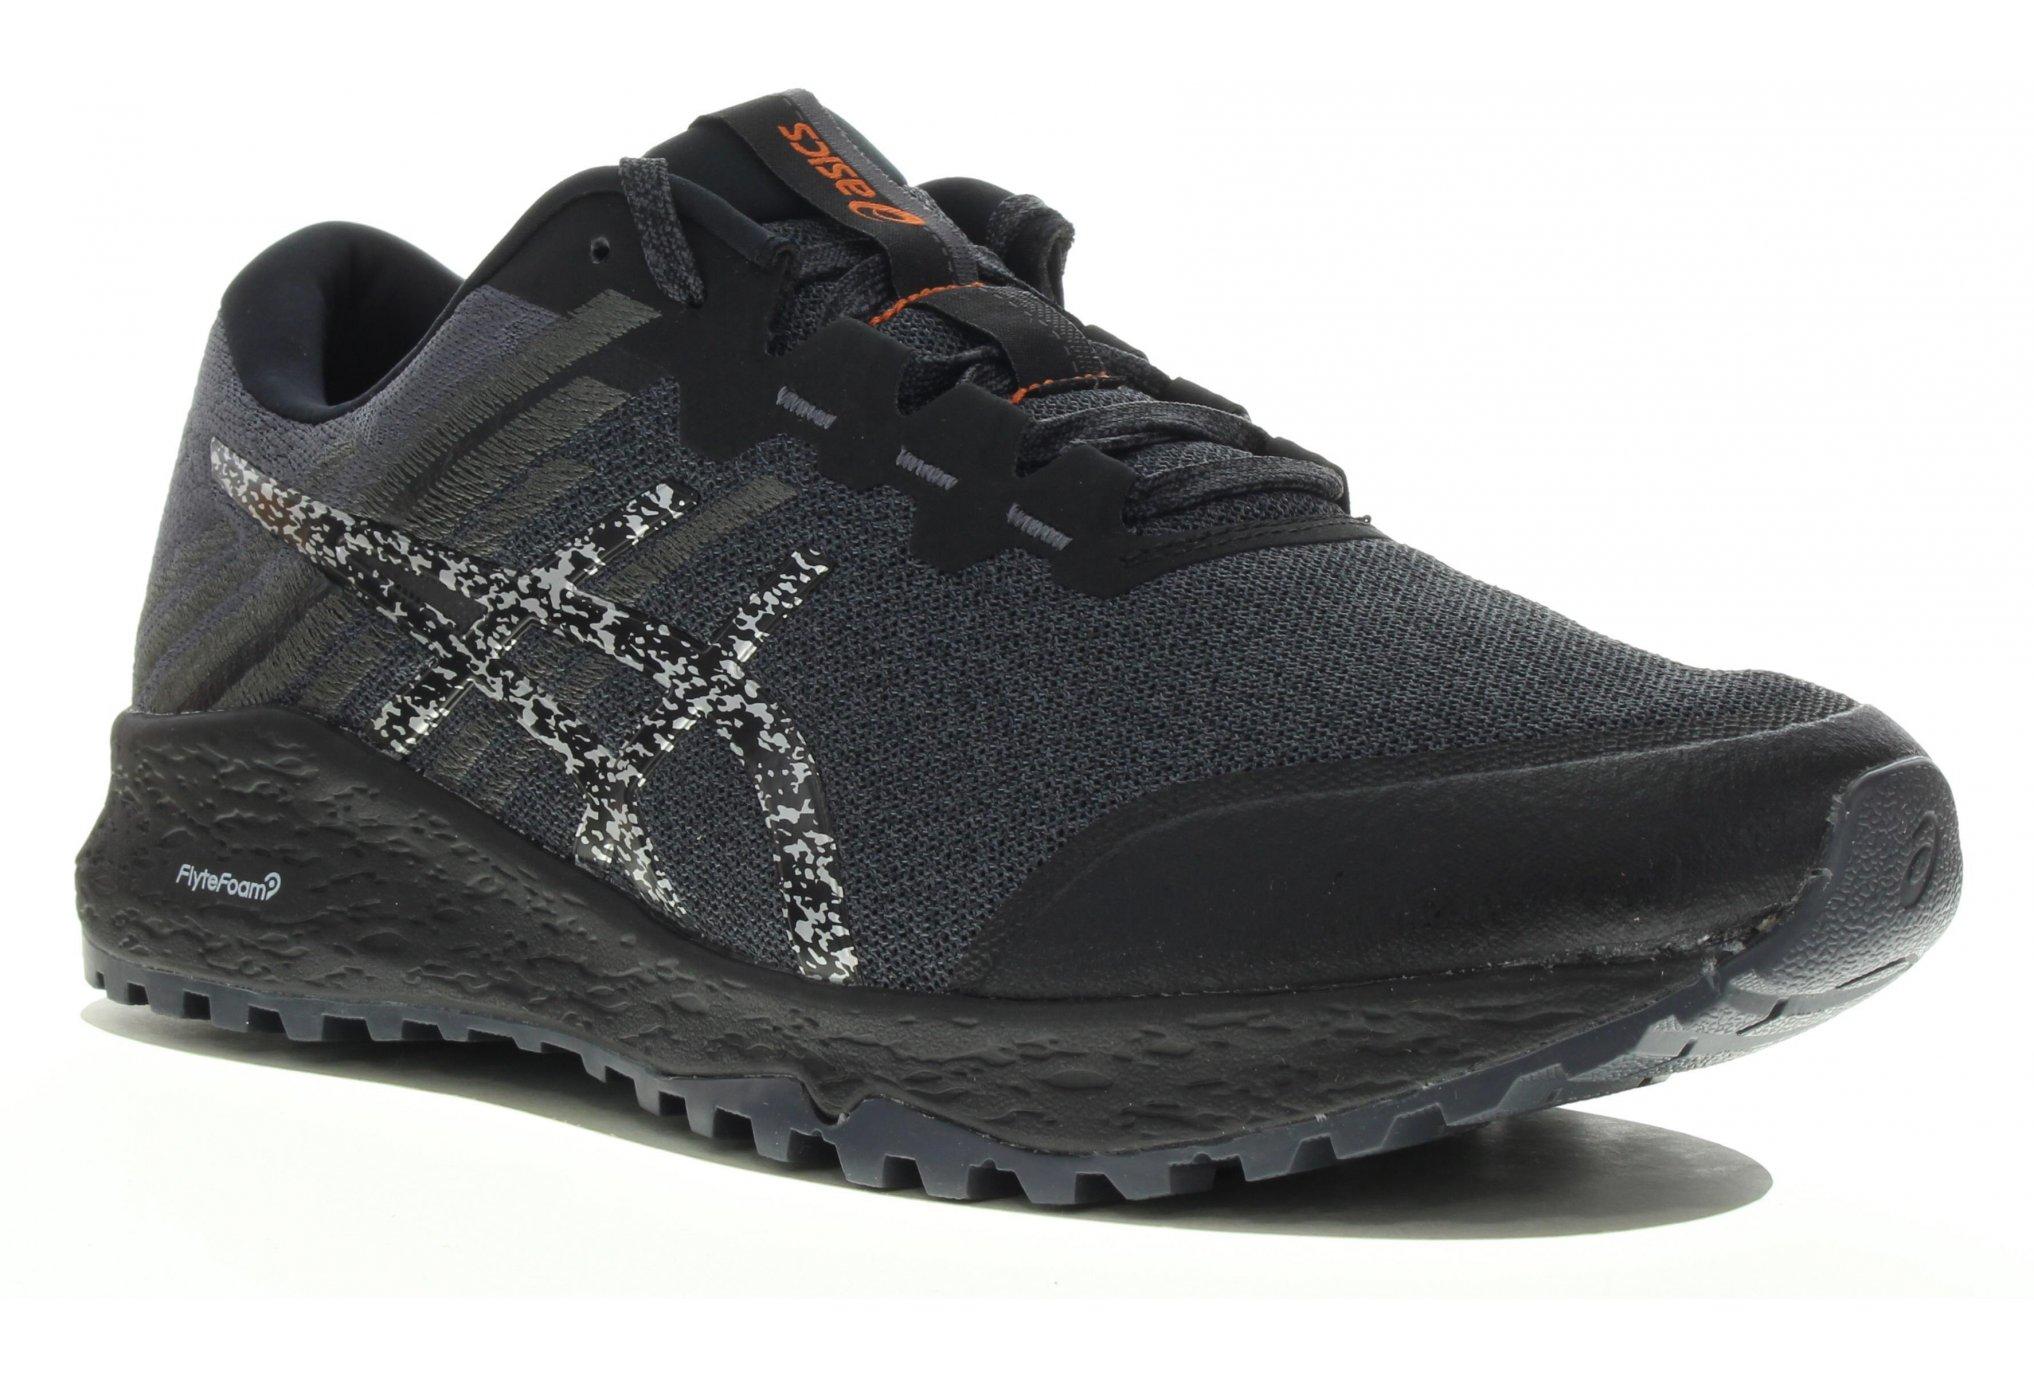 Asics Alpine XT 2 Chaussures homme